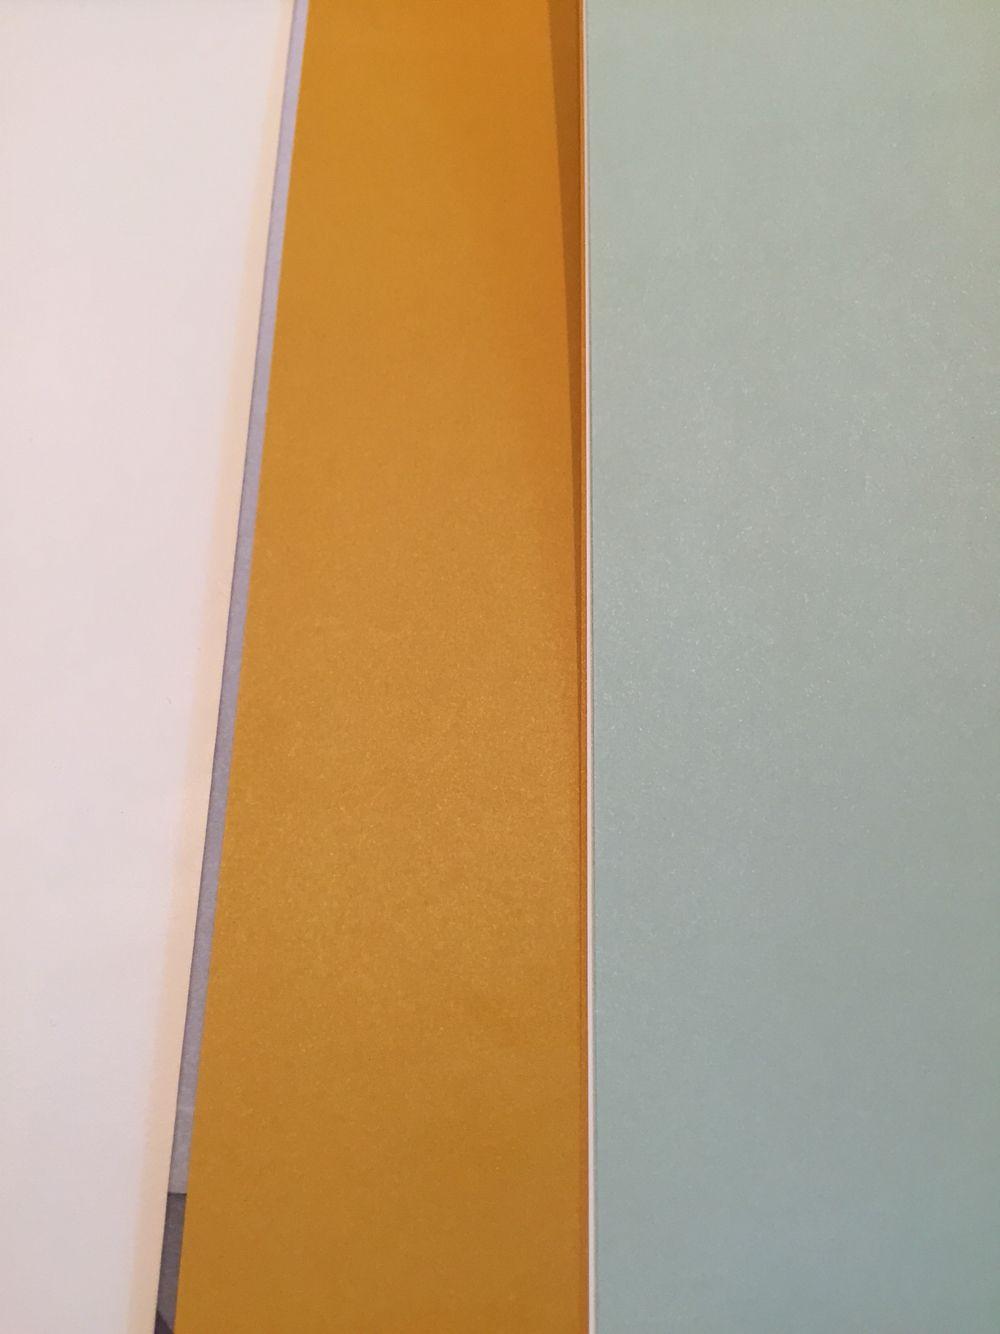 Book color palette - Book Of Color Palette New Scenes Book Color Palette Bleached Pink Golden Rod And Mint